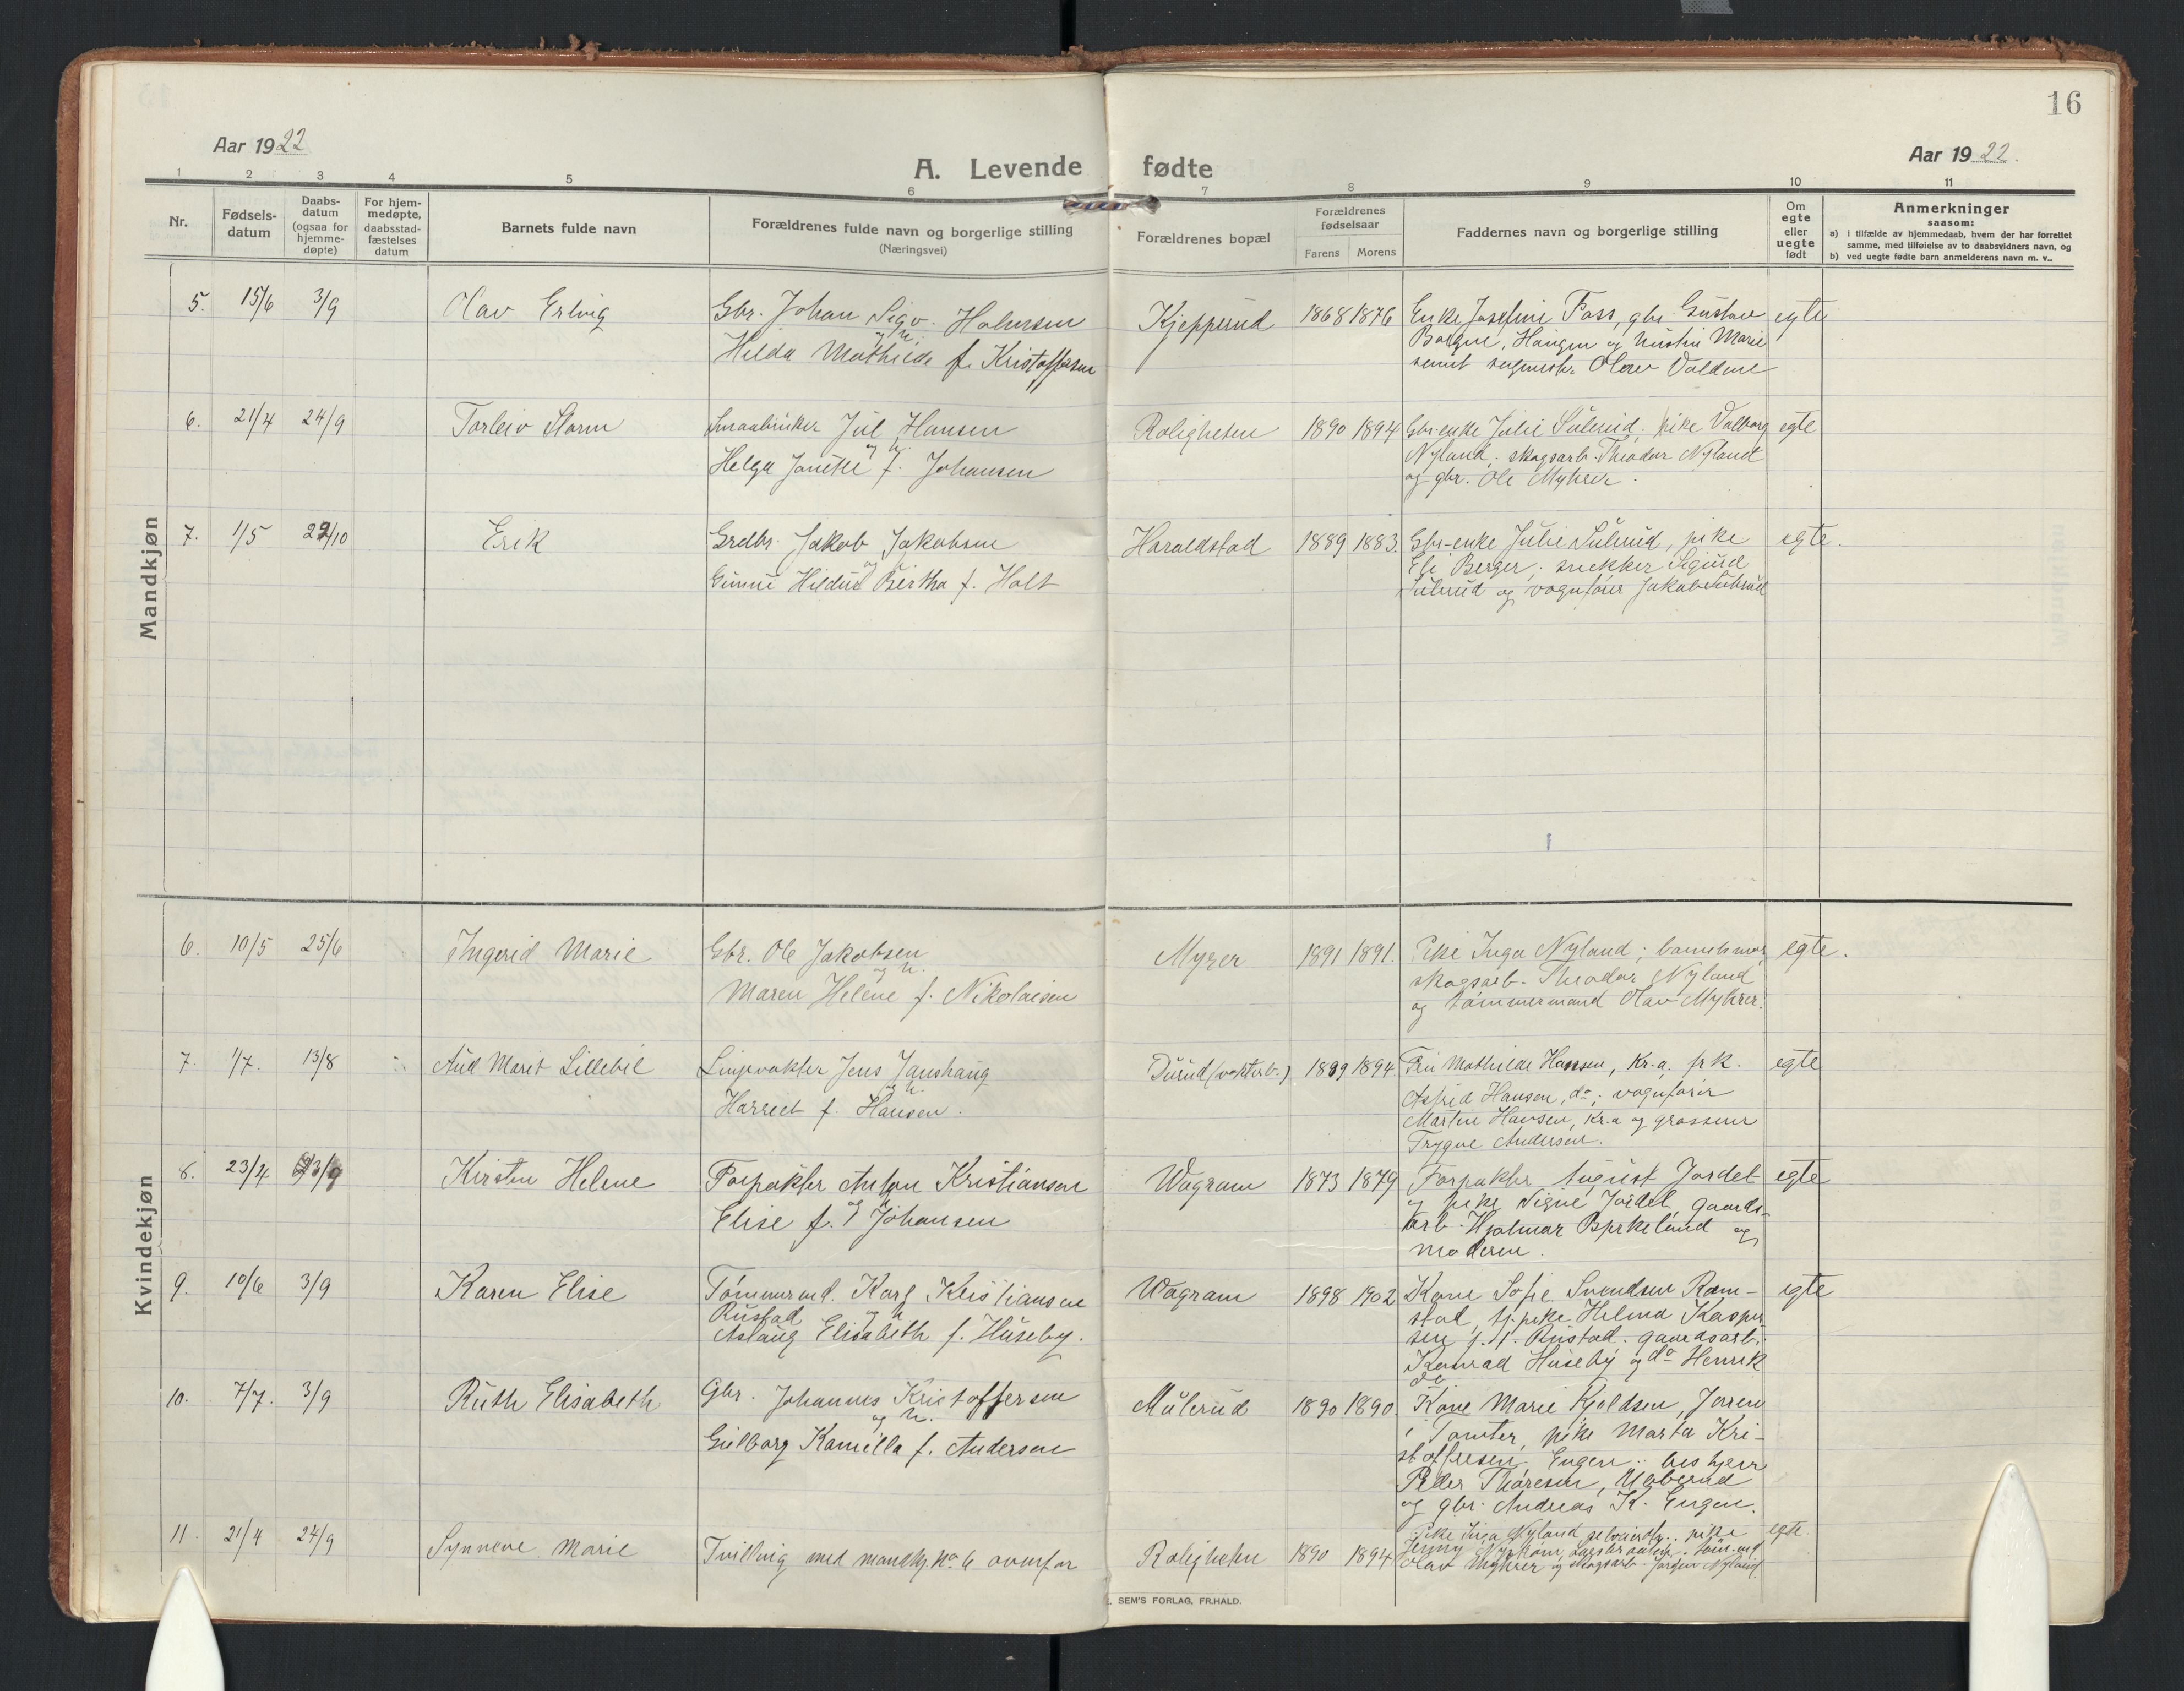 SAO, Enebakk prestekontor Kirkebøker, F/Fb/L0003: Parish register (official) no. II 3, 1912-1946, p. 16